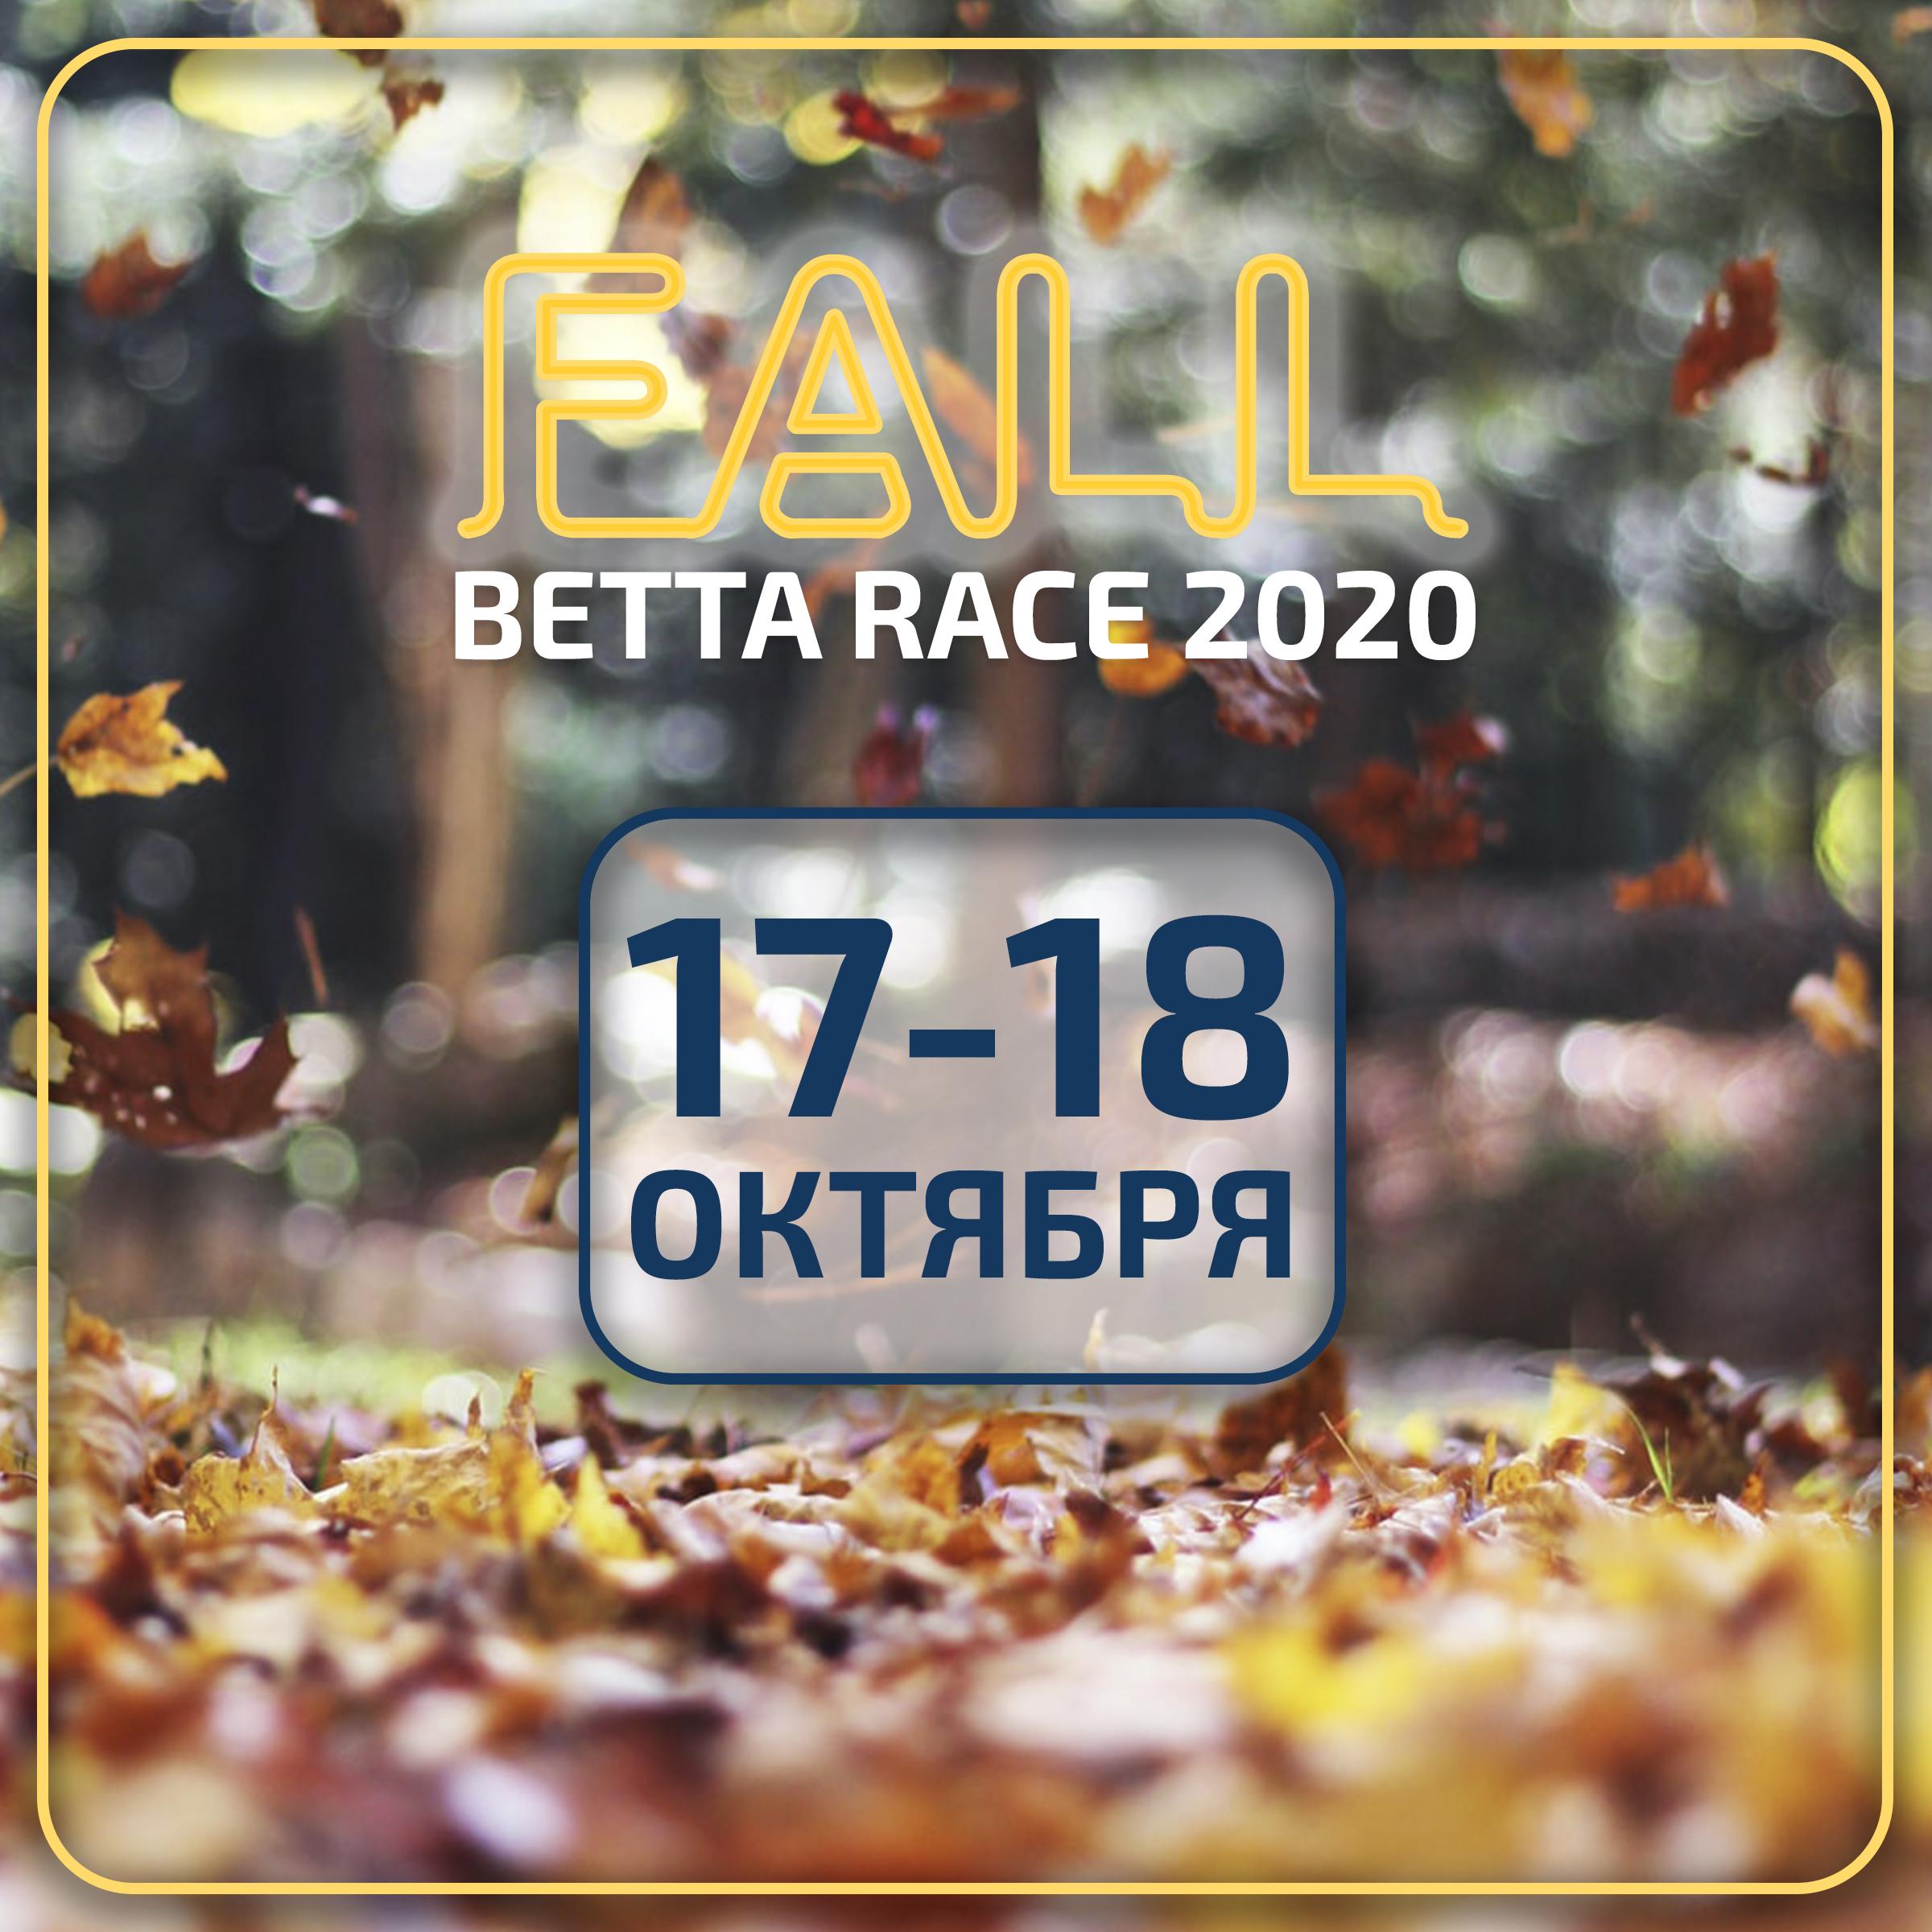 FALL BETTA RACE 17.10.2020